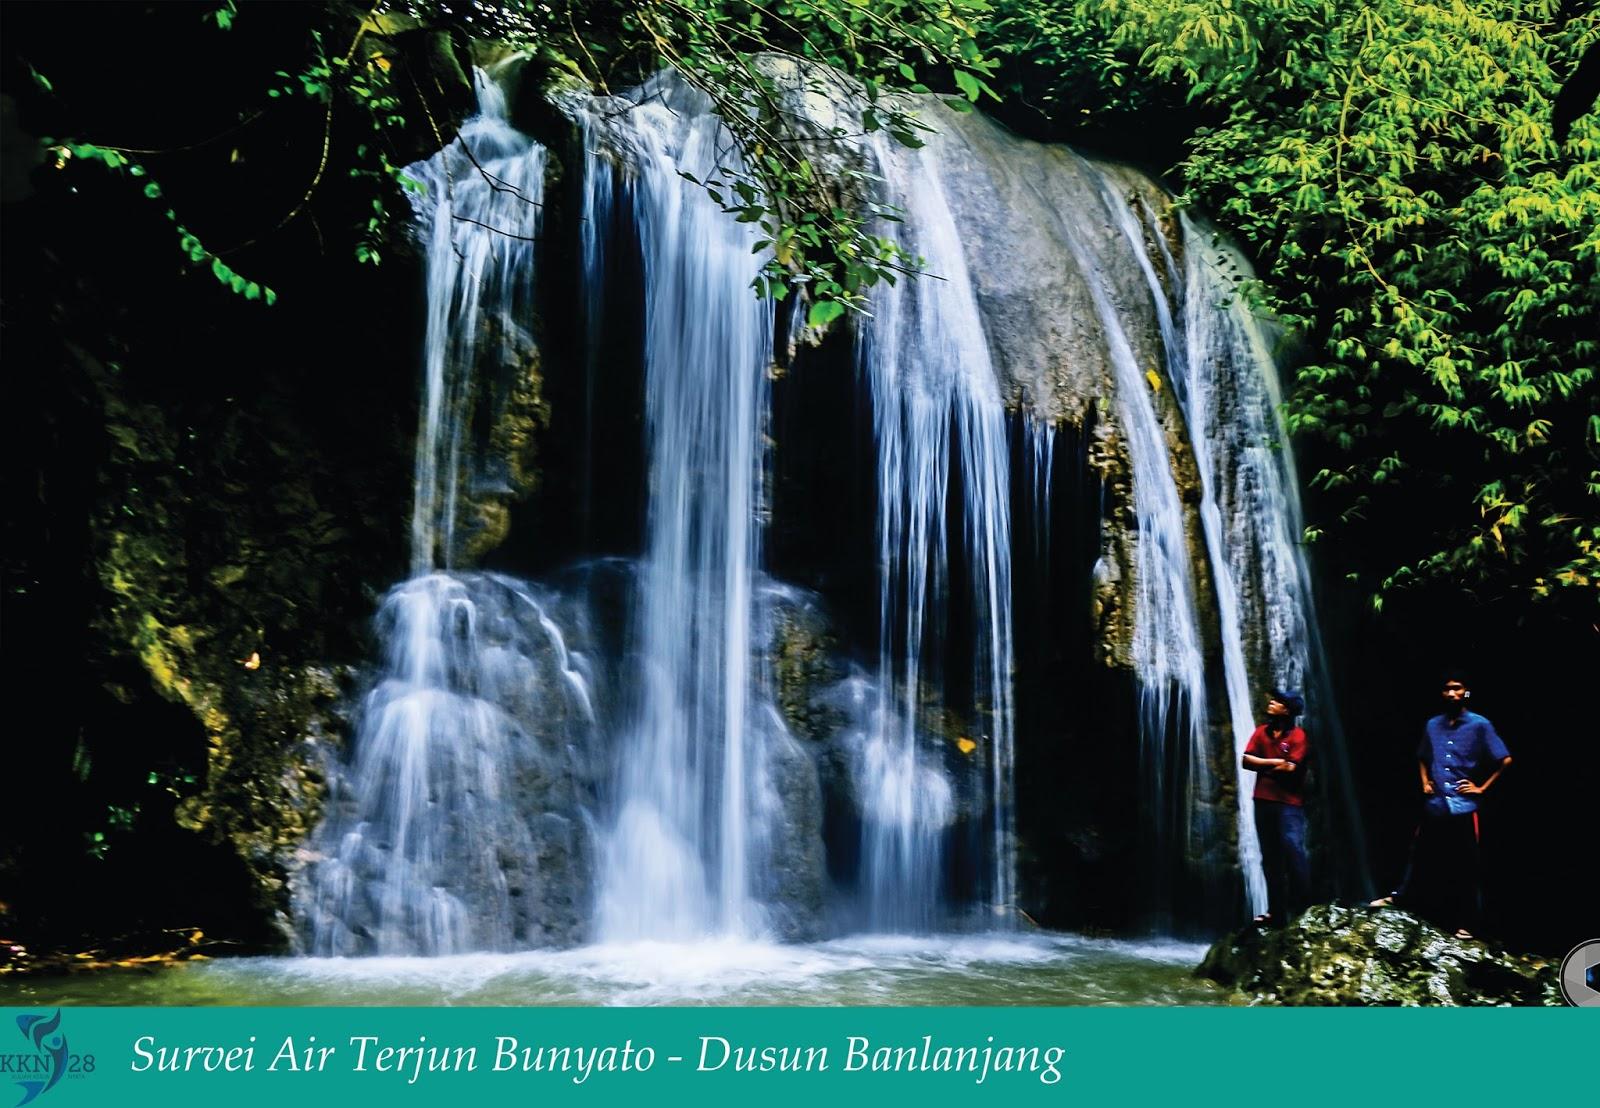 Wisata Air Terjun Bunyato (Pengantin Waterfall)